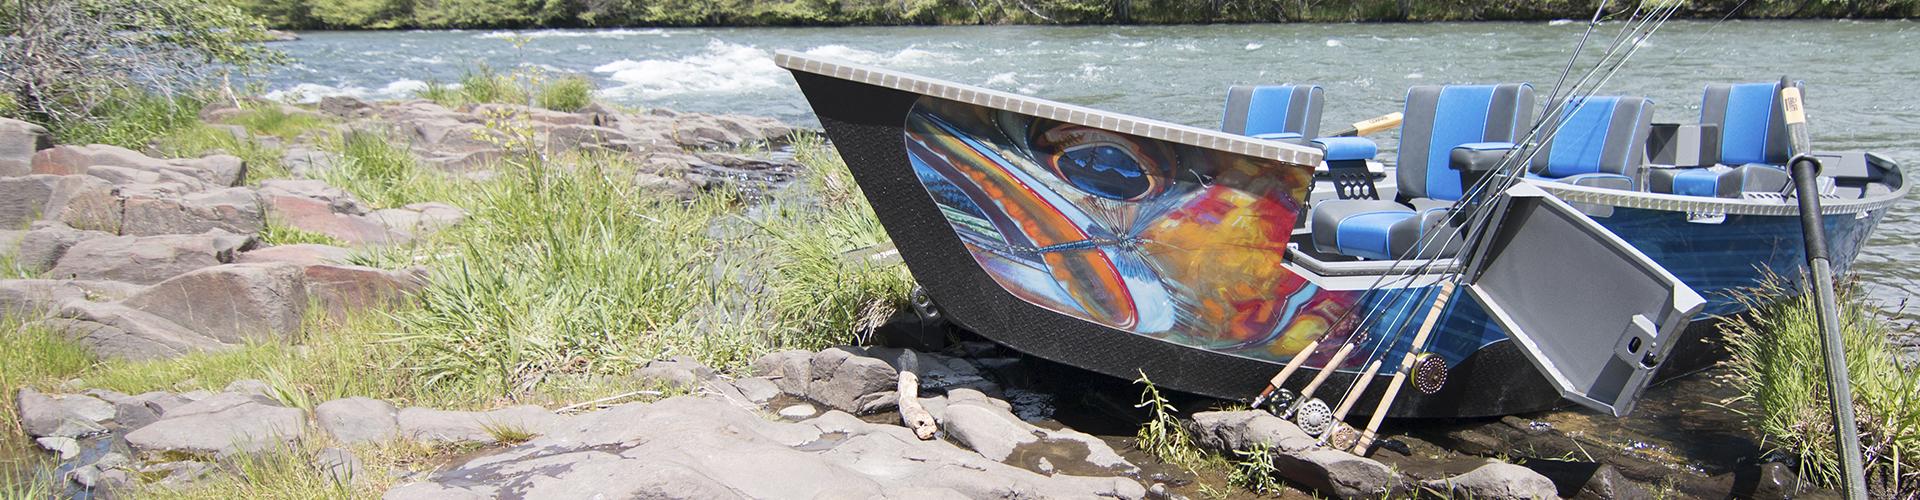 Drift Boat Drift Boat